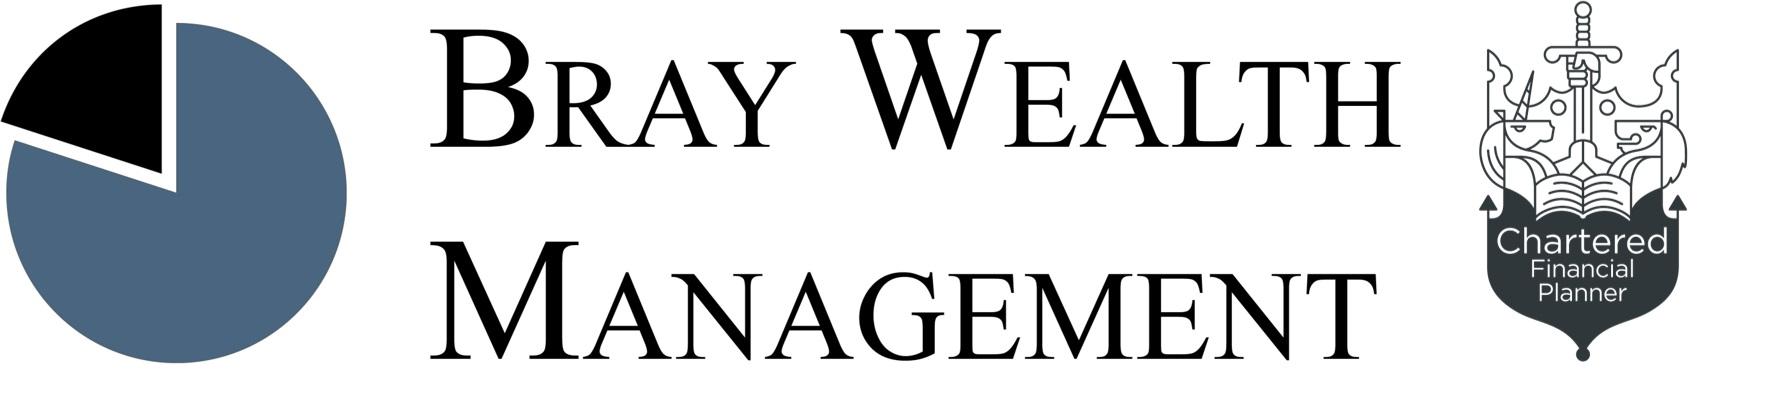 Bray Wealth Management